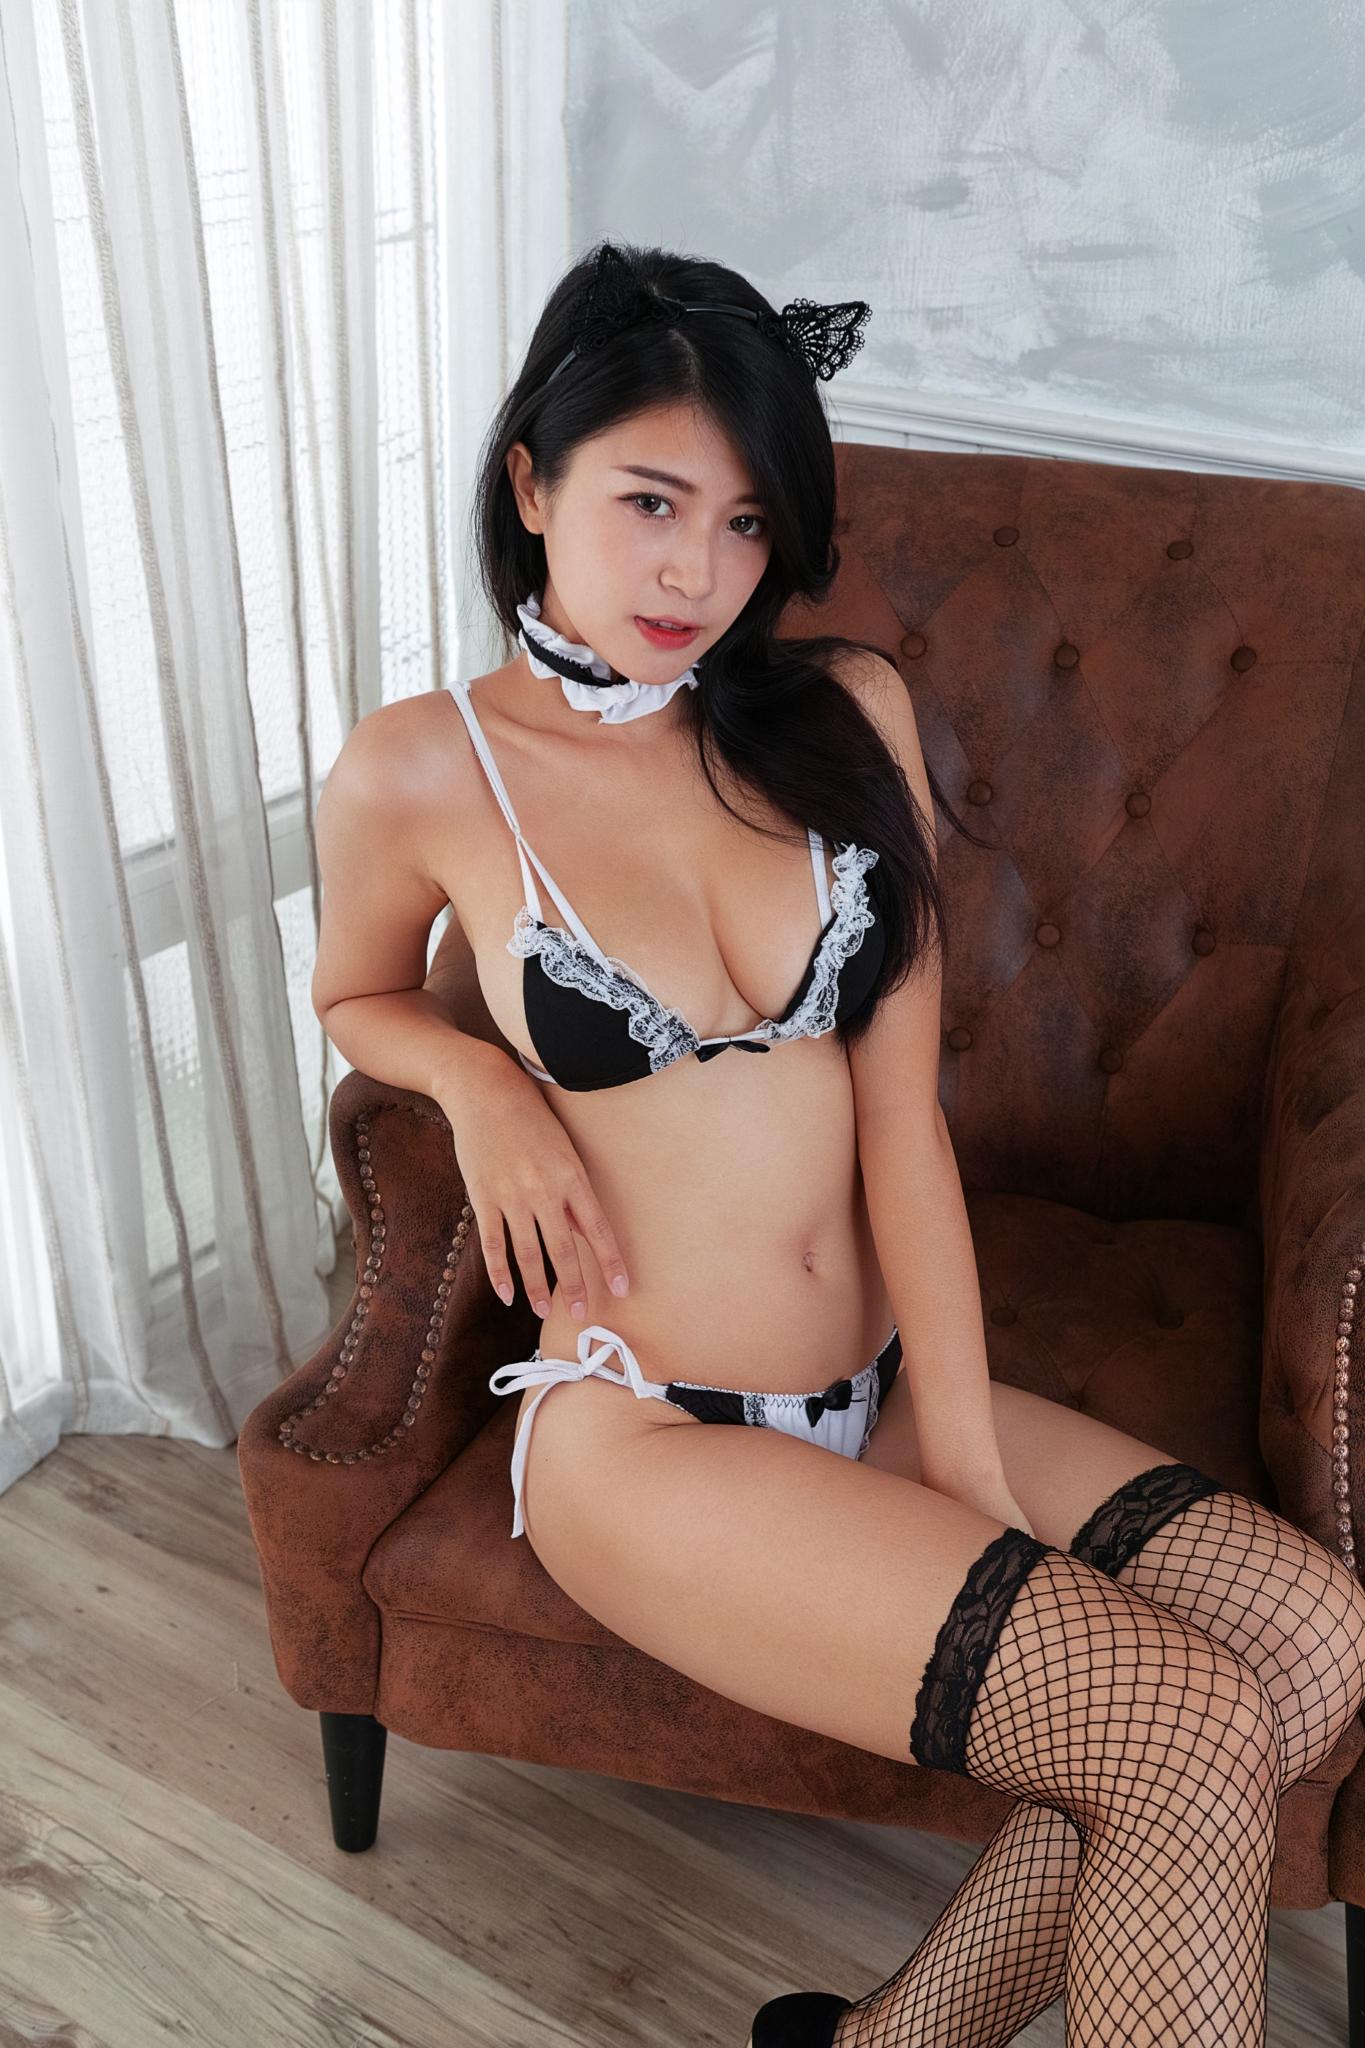 Asian girl in stockings